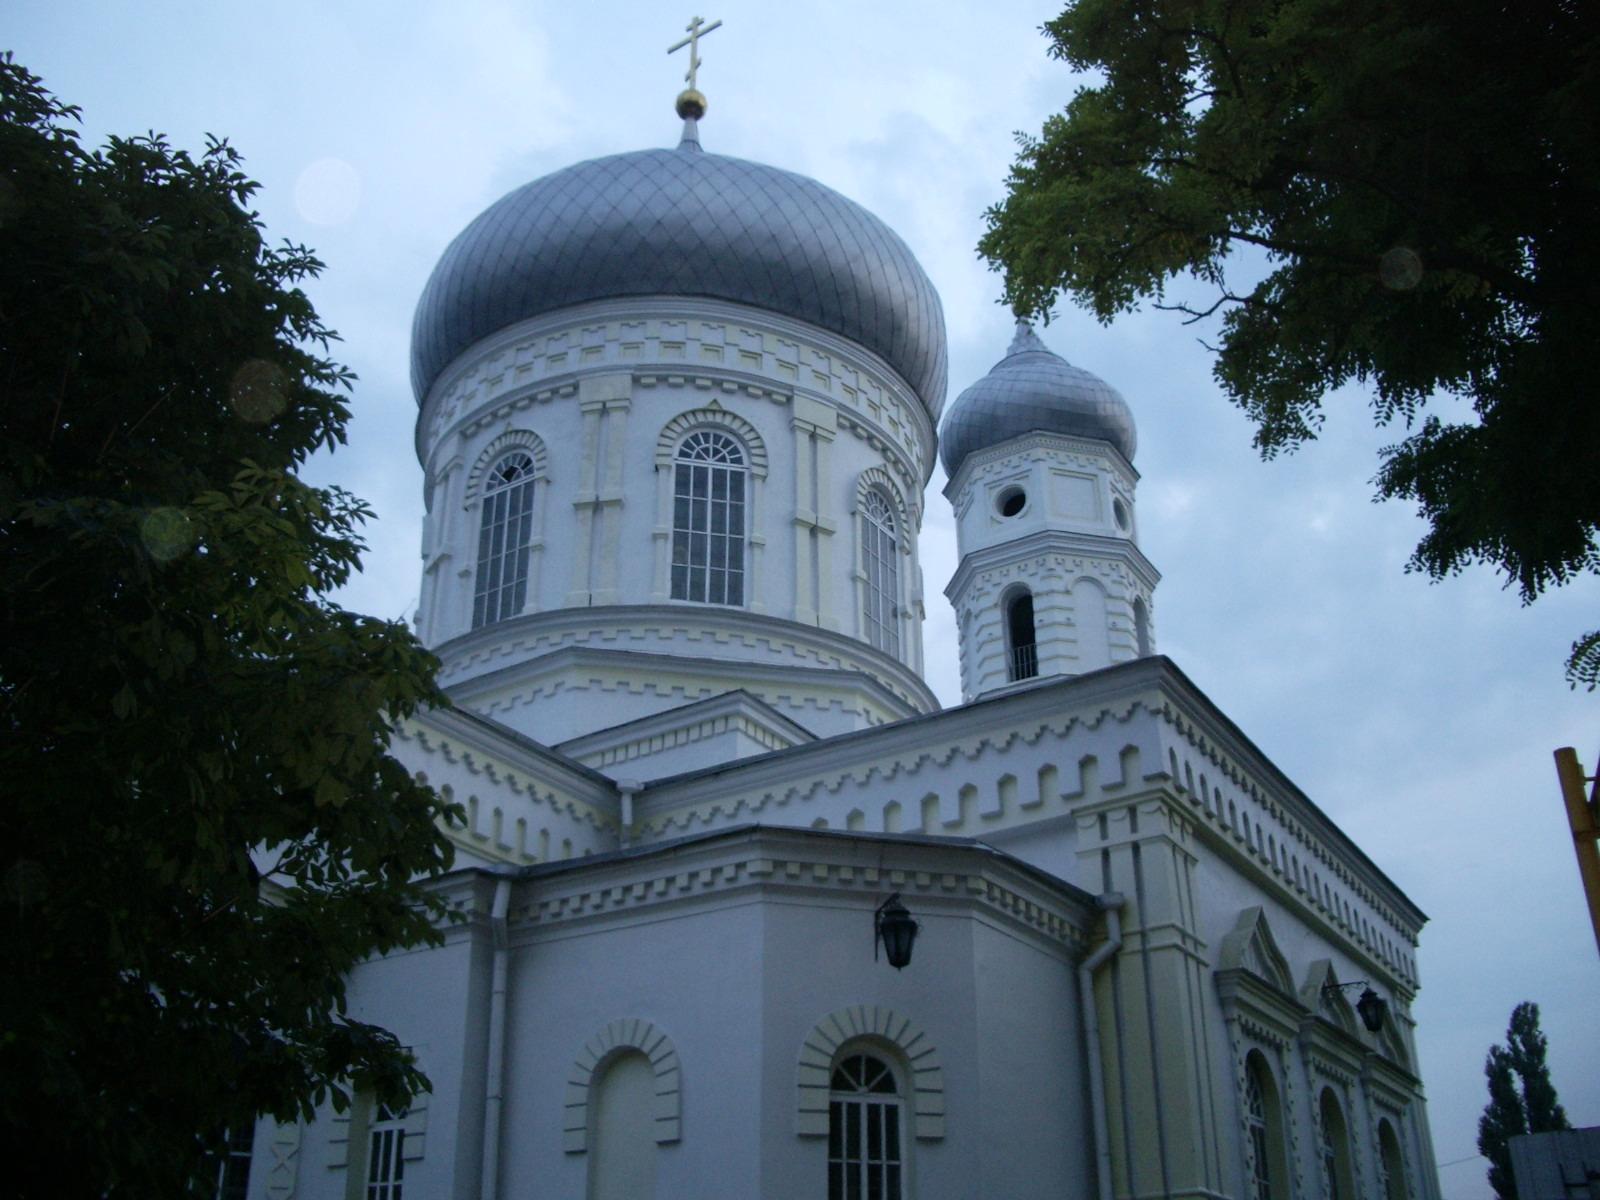 Pavlograd: a selection of sites